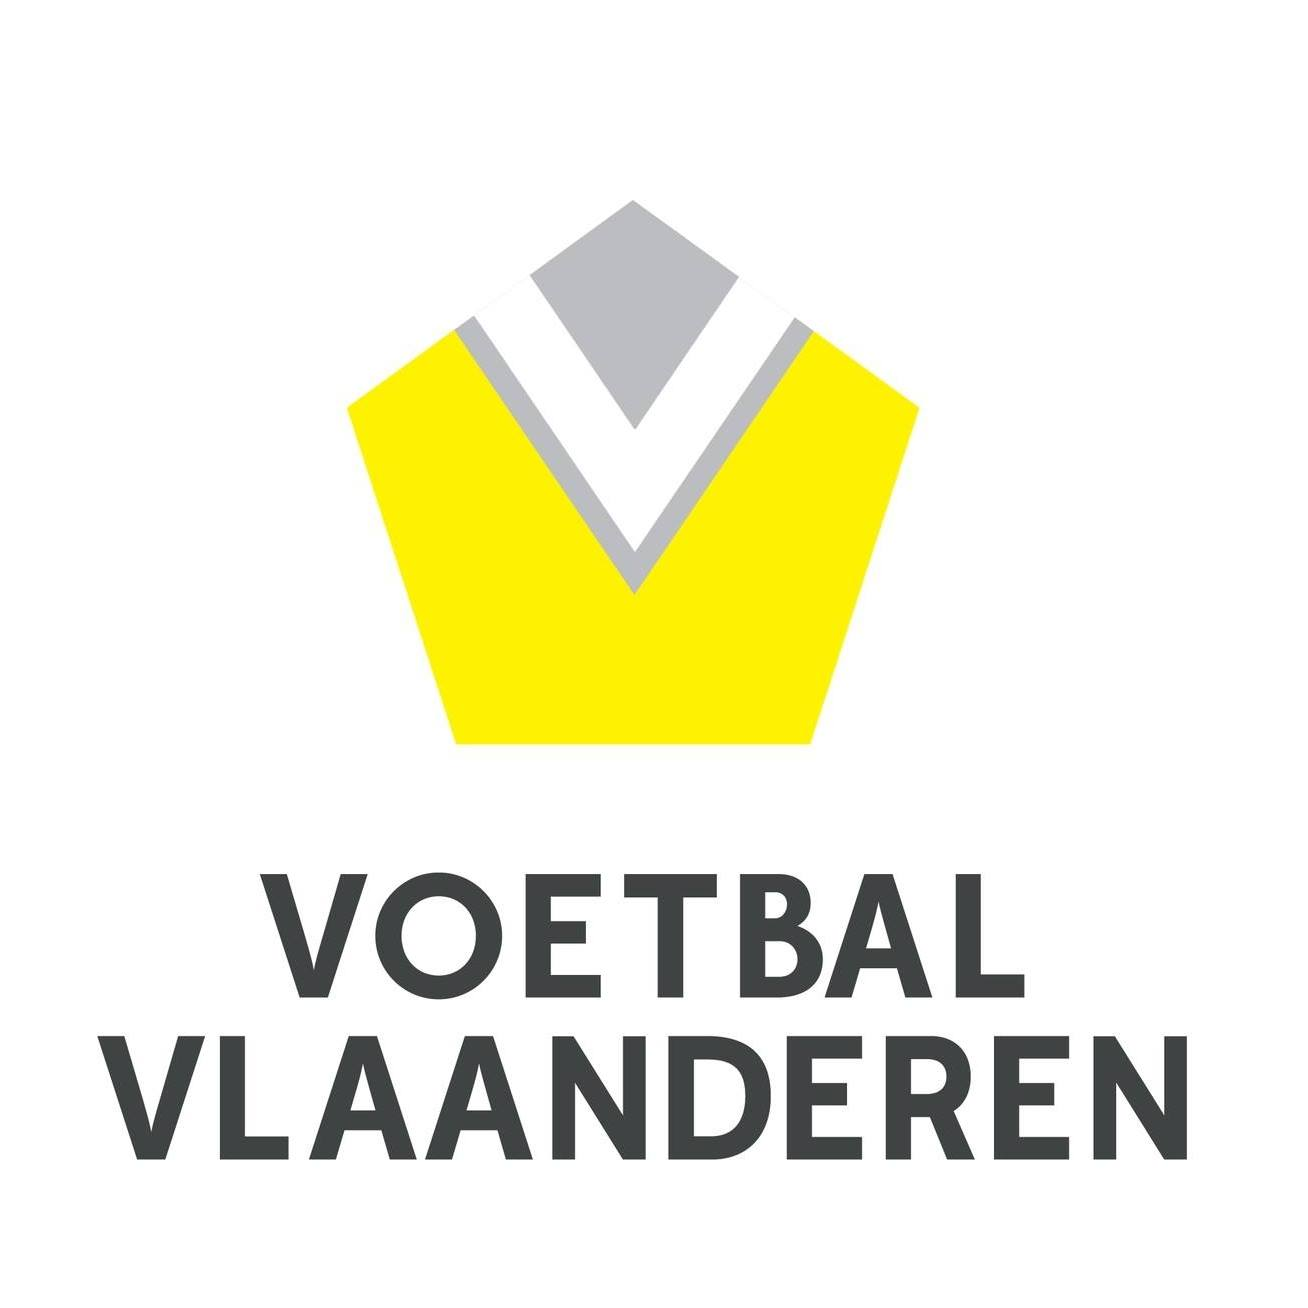 1P Training en cursus @ VV Wommelgem | Wommelgem | Vlaanderen | België